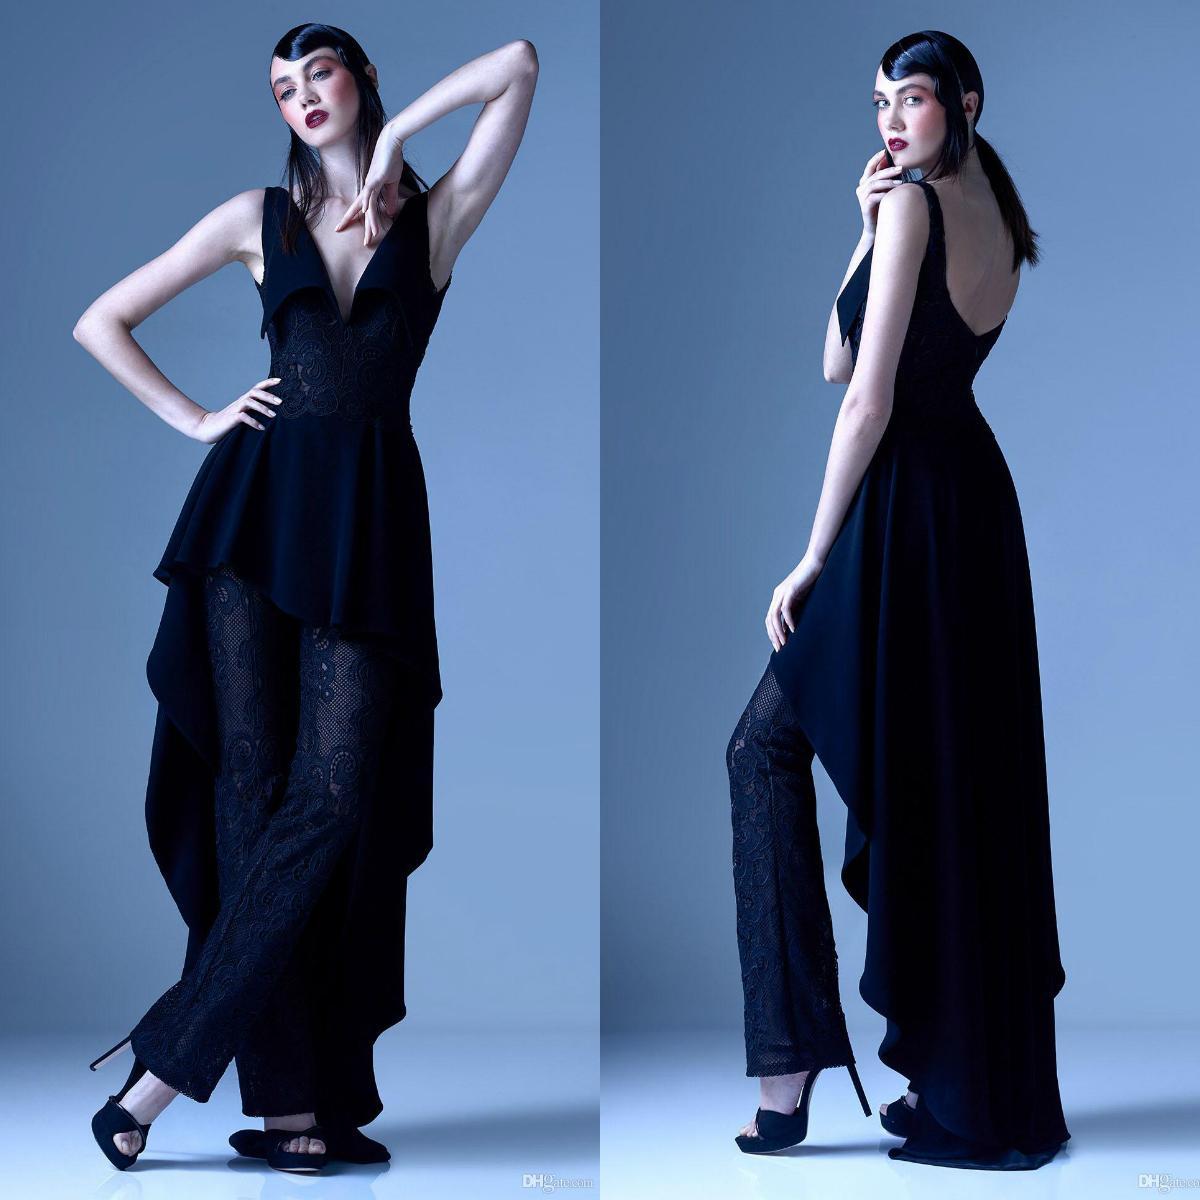 2020 Dark Navy Jumpsuits Prom Dresses Peplum V Neck Lace Appliqued Pants Dress Evening Wear Vintage Long Formal Party Gowns